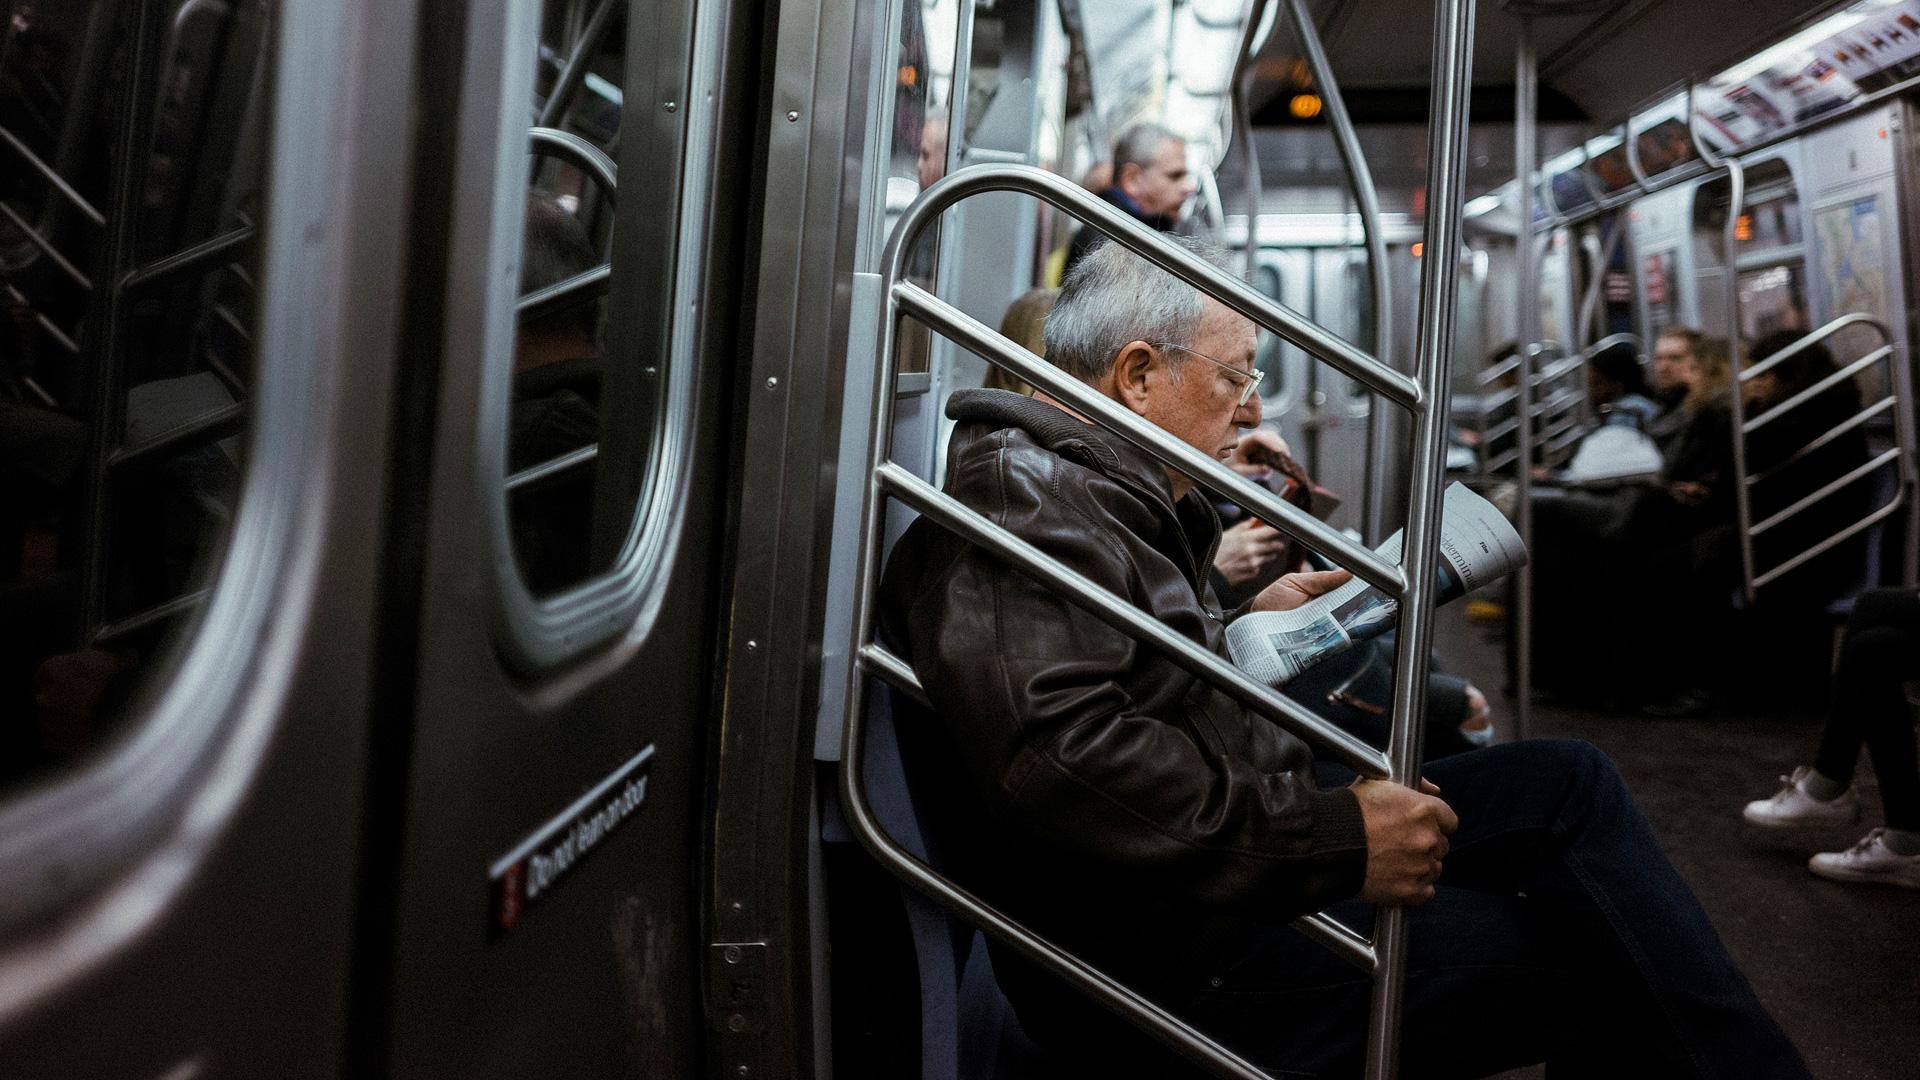 Older man sitting on the NYC Subway.